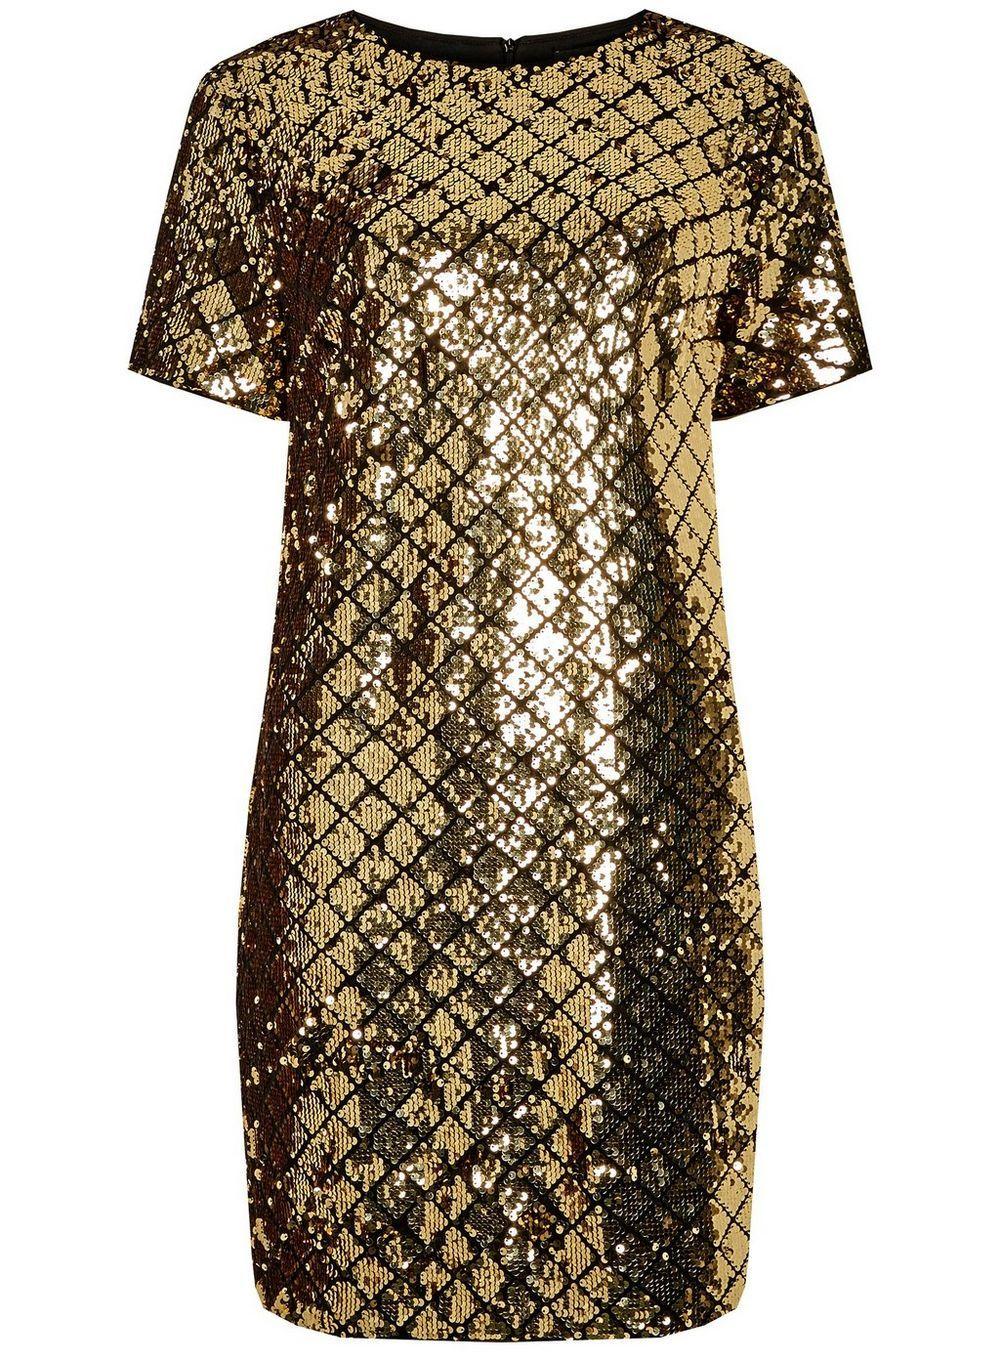 Gold Diamond Sequin Shift Dress Dorothy Perkins Shift Dress Mini Shift Dress Midi Shift Dress [ 1361 x 1000 Pixel ]